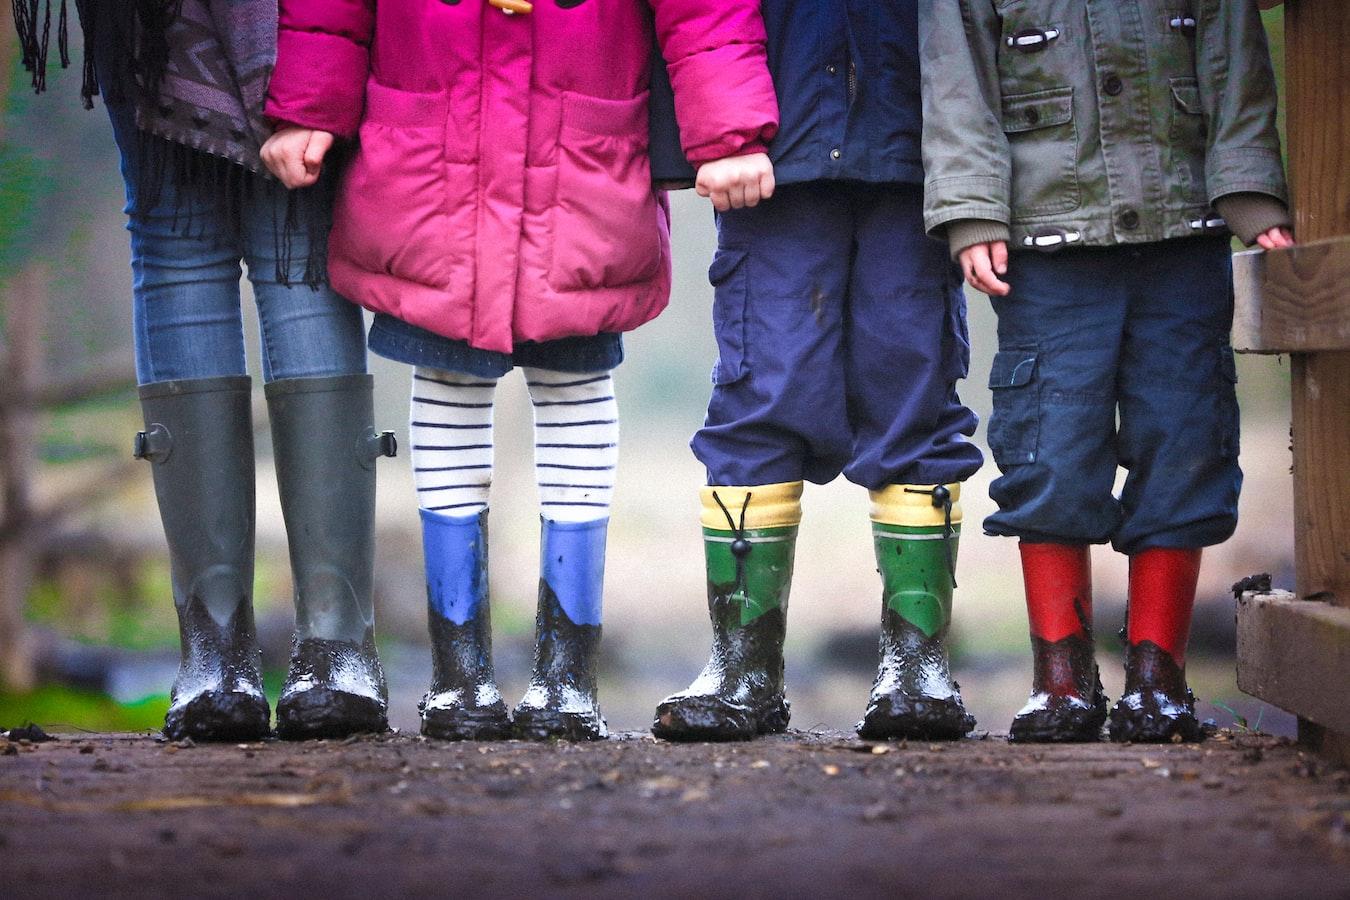 Four children wearing rain boots